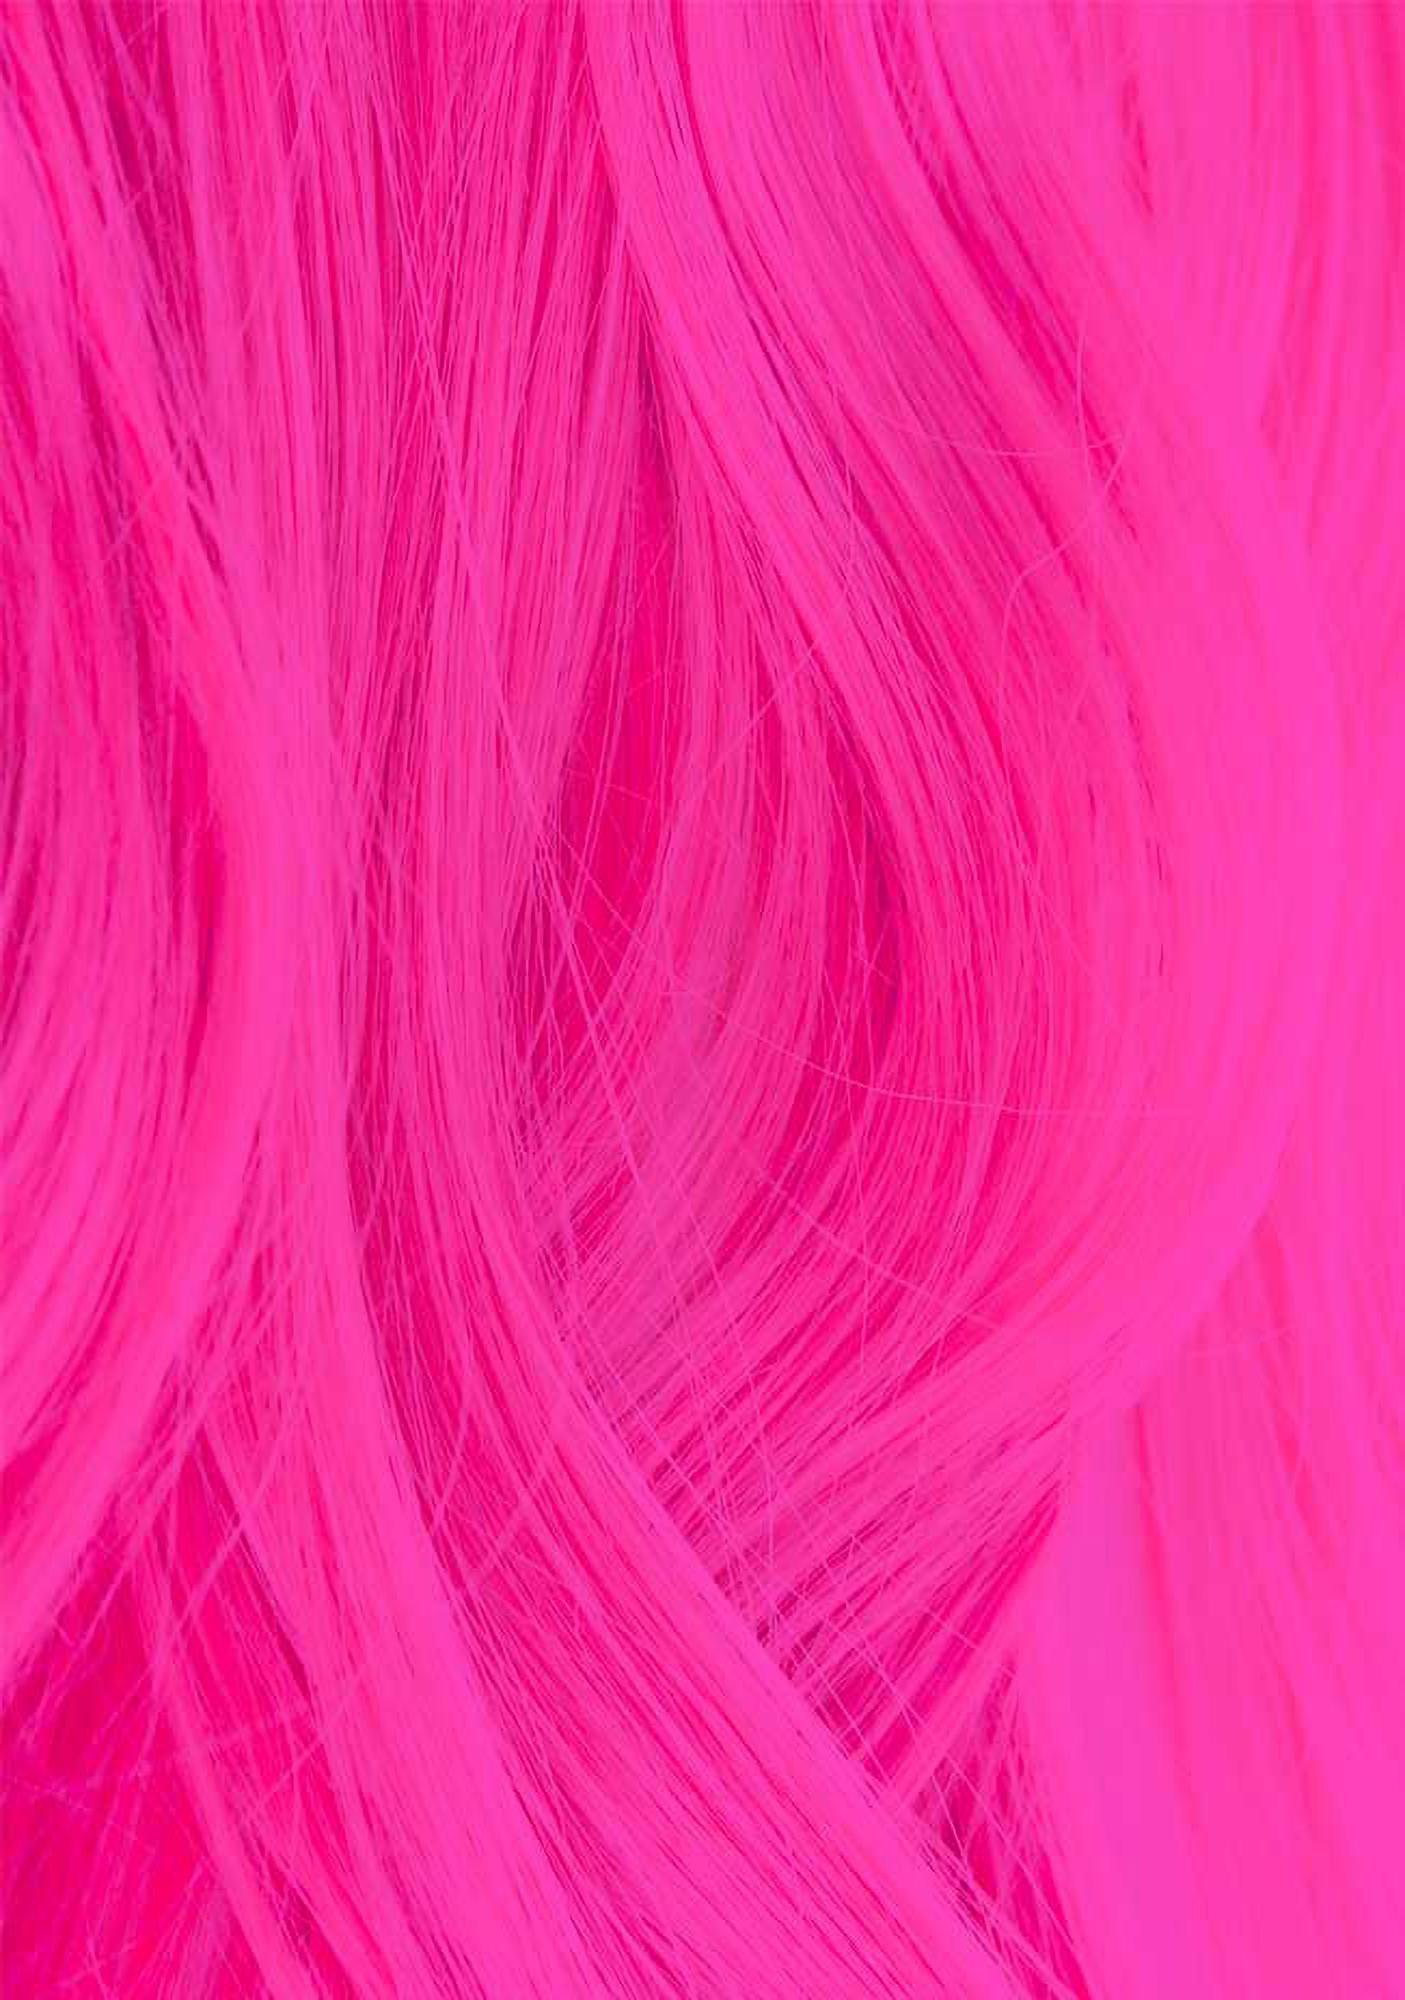 Uv Reactive 310 Neon Pink Hair Dye Pink Hair Dye Neon Hair